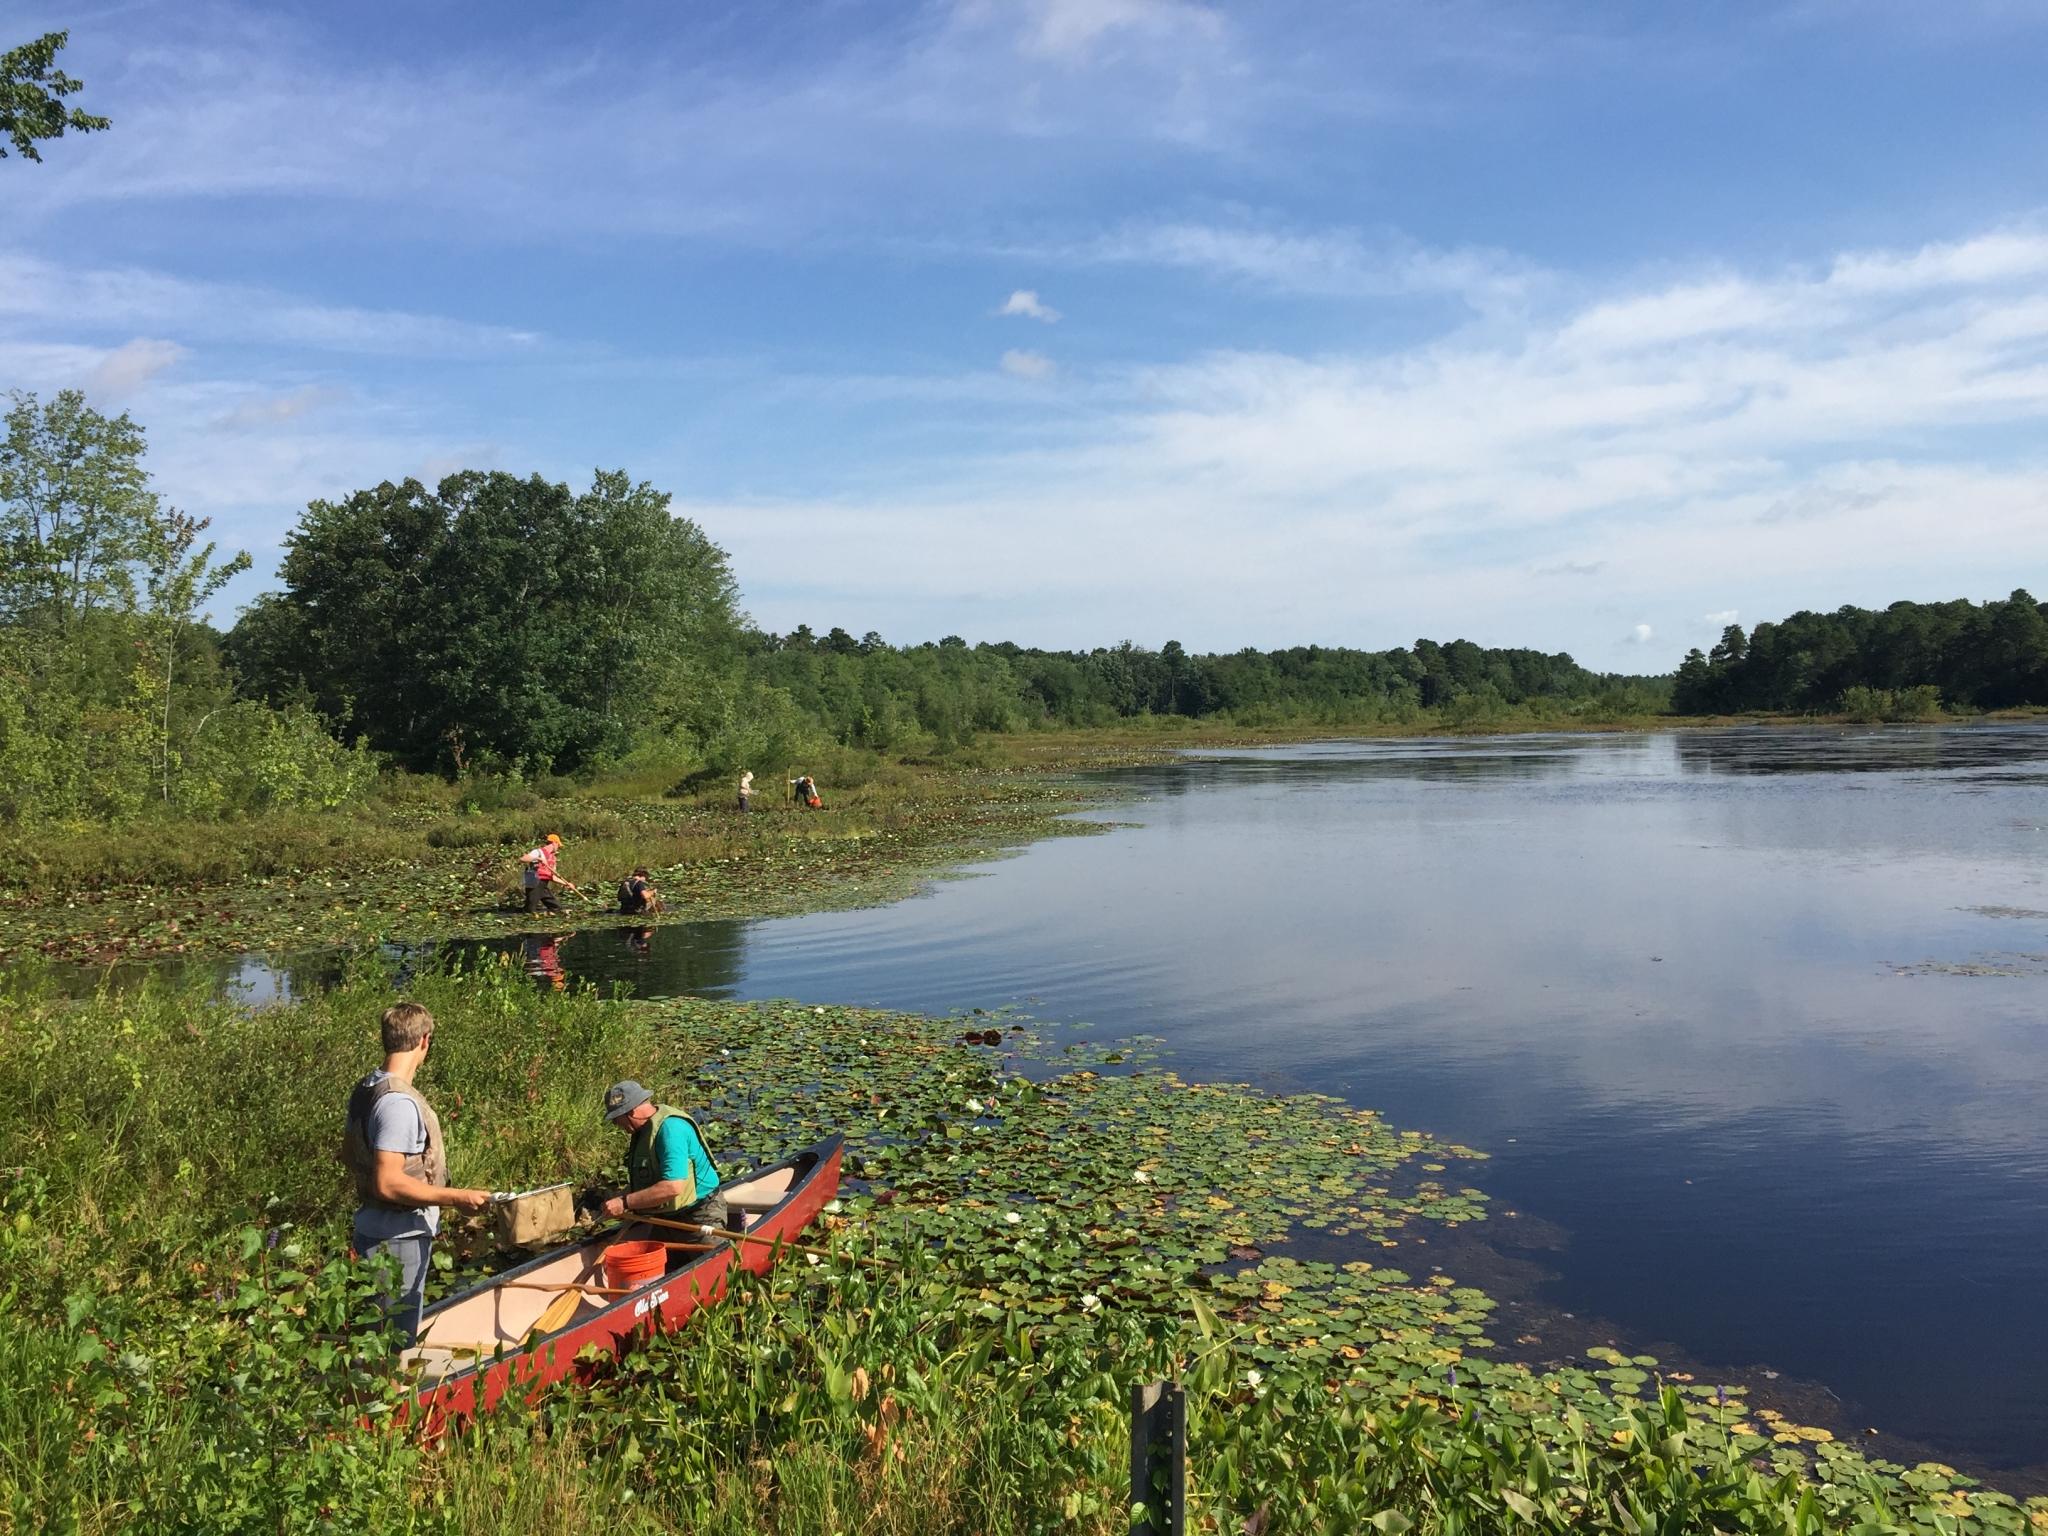 Maurice River, NJ, credit: Karla Rossini, Tributary Manumuskin Cumberland Pond, National Park Service Dragonfly Sampling Project